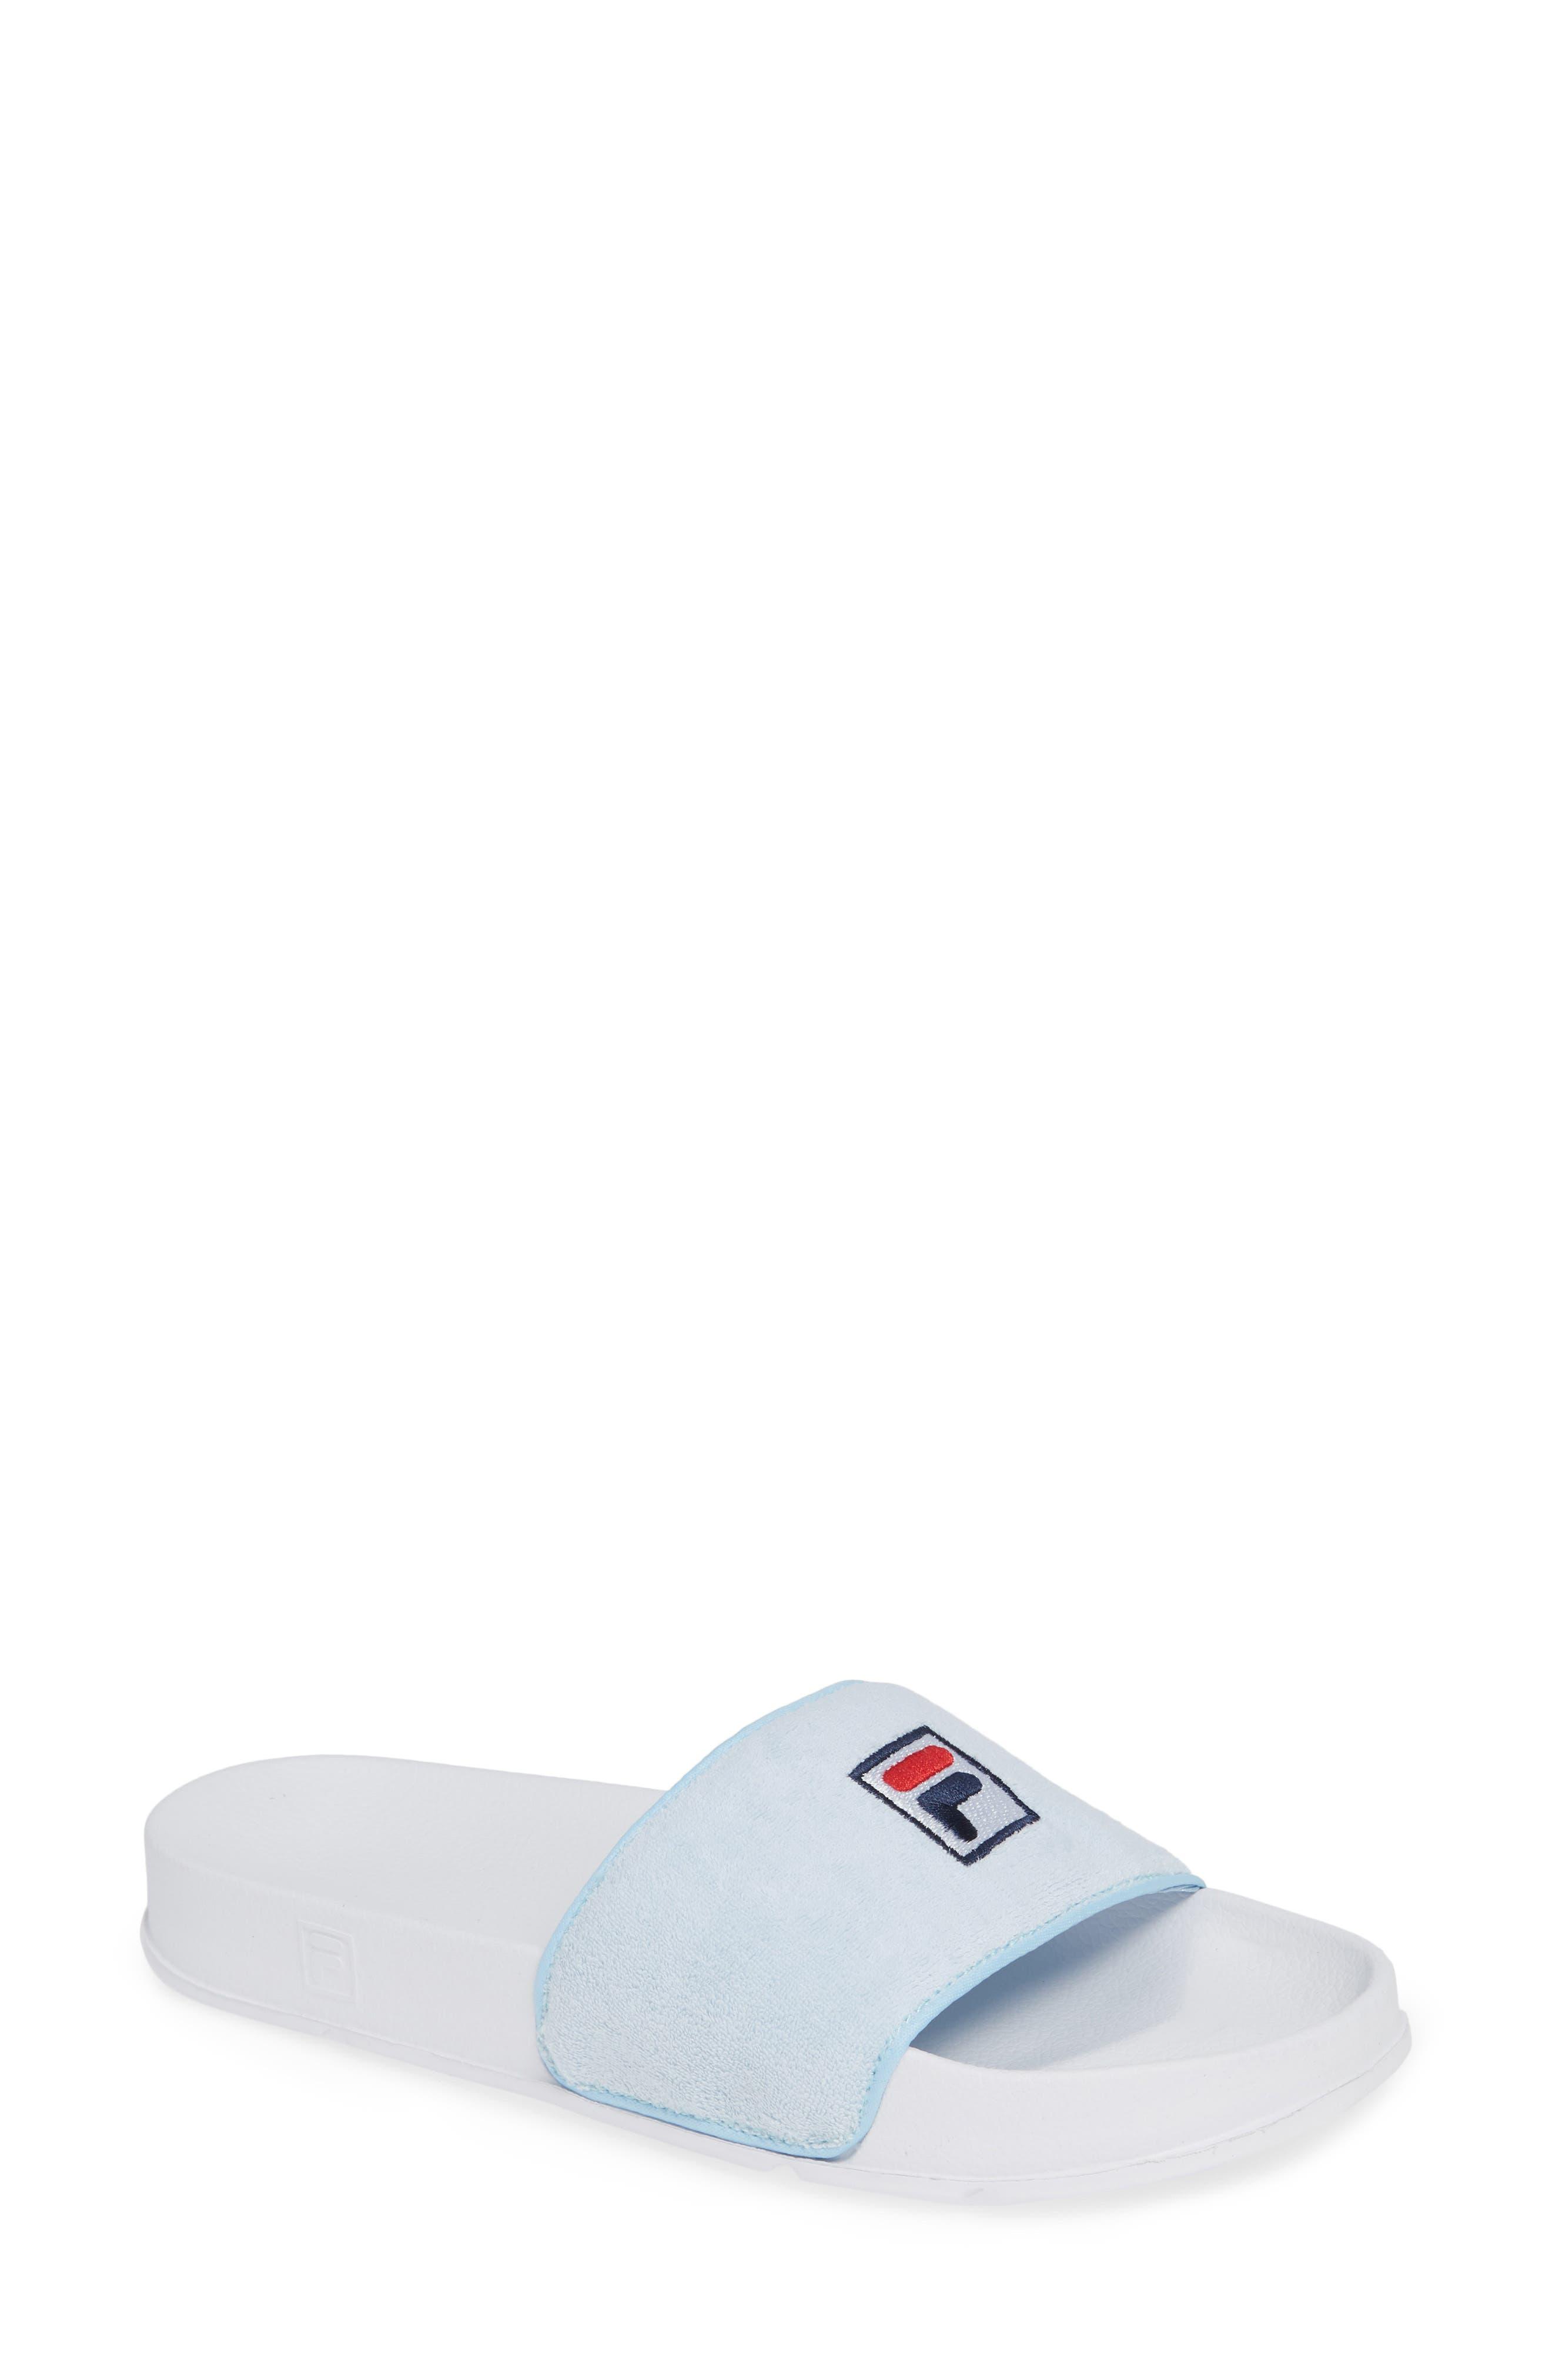 Terry Slide Sandal,                         Main,                         color, SKYW/ SKYW/ WHT